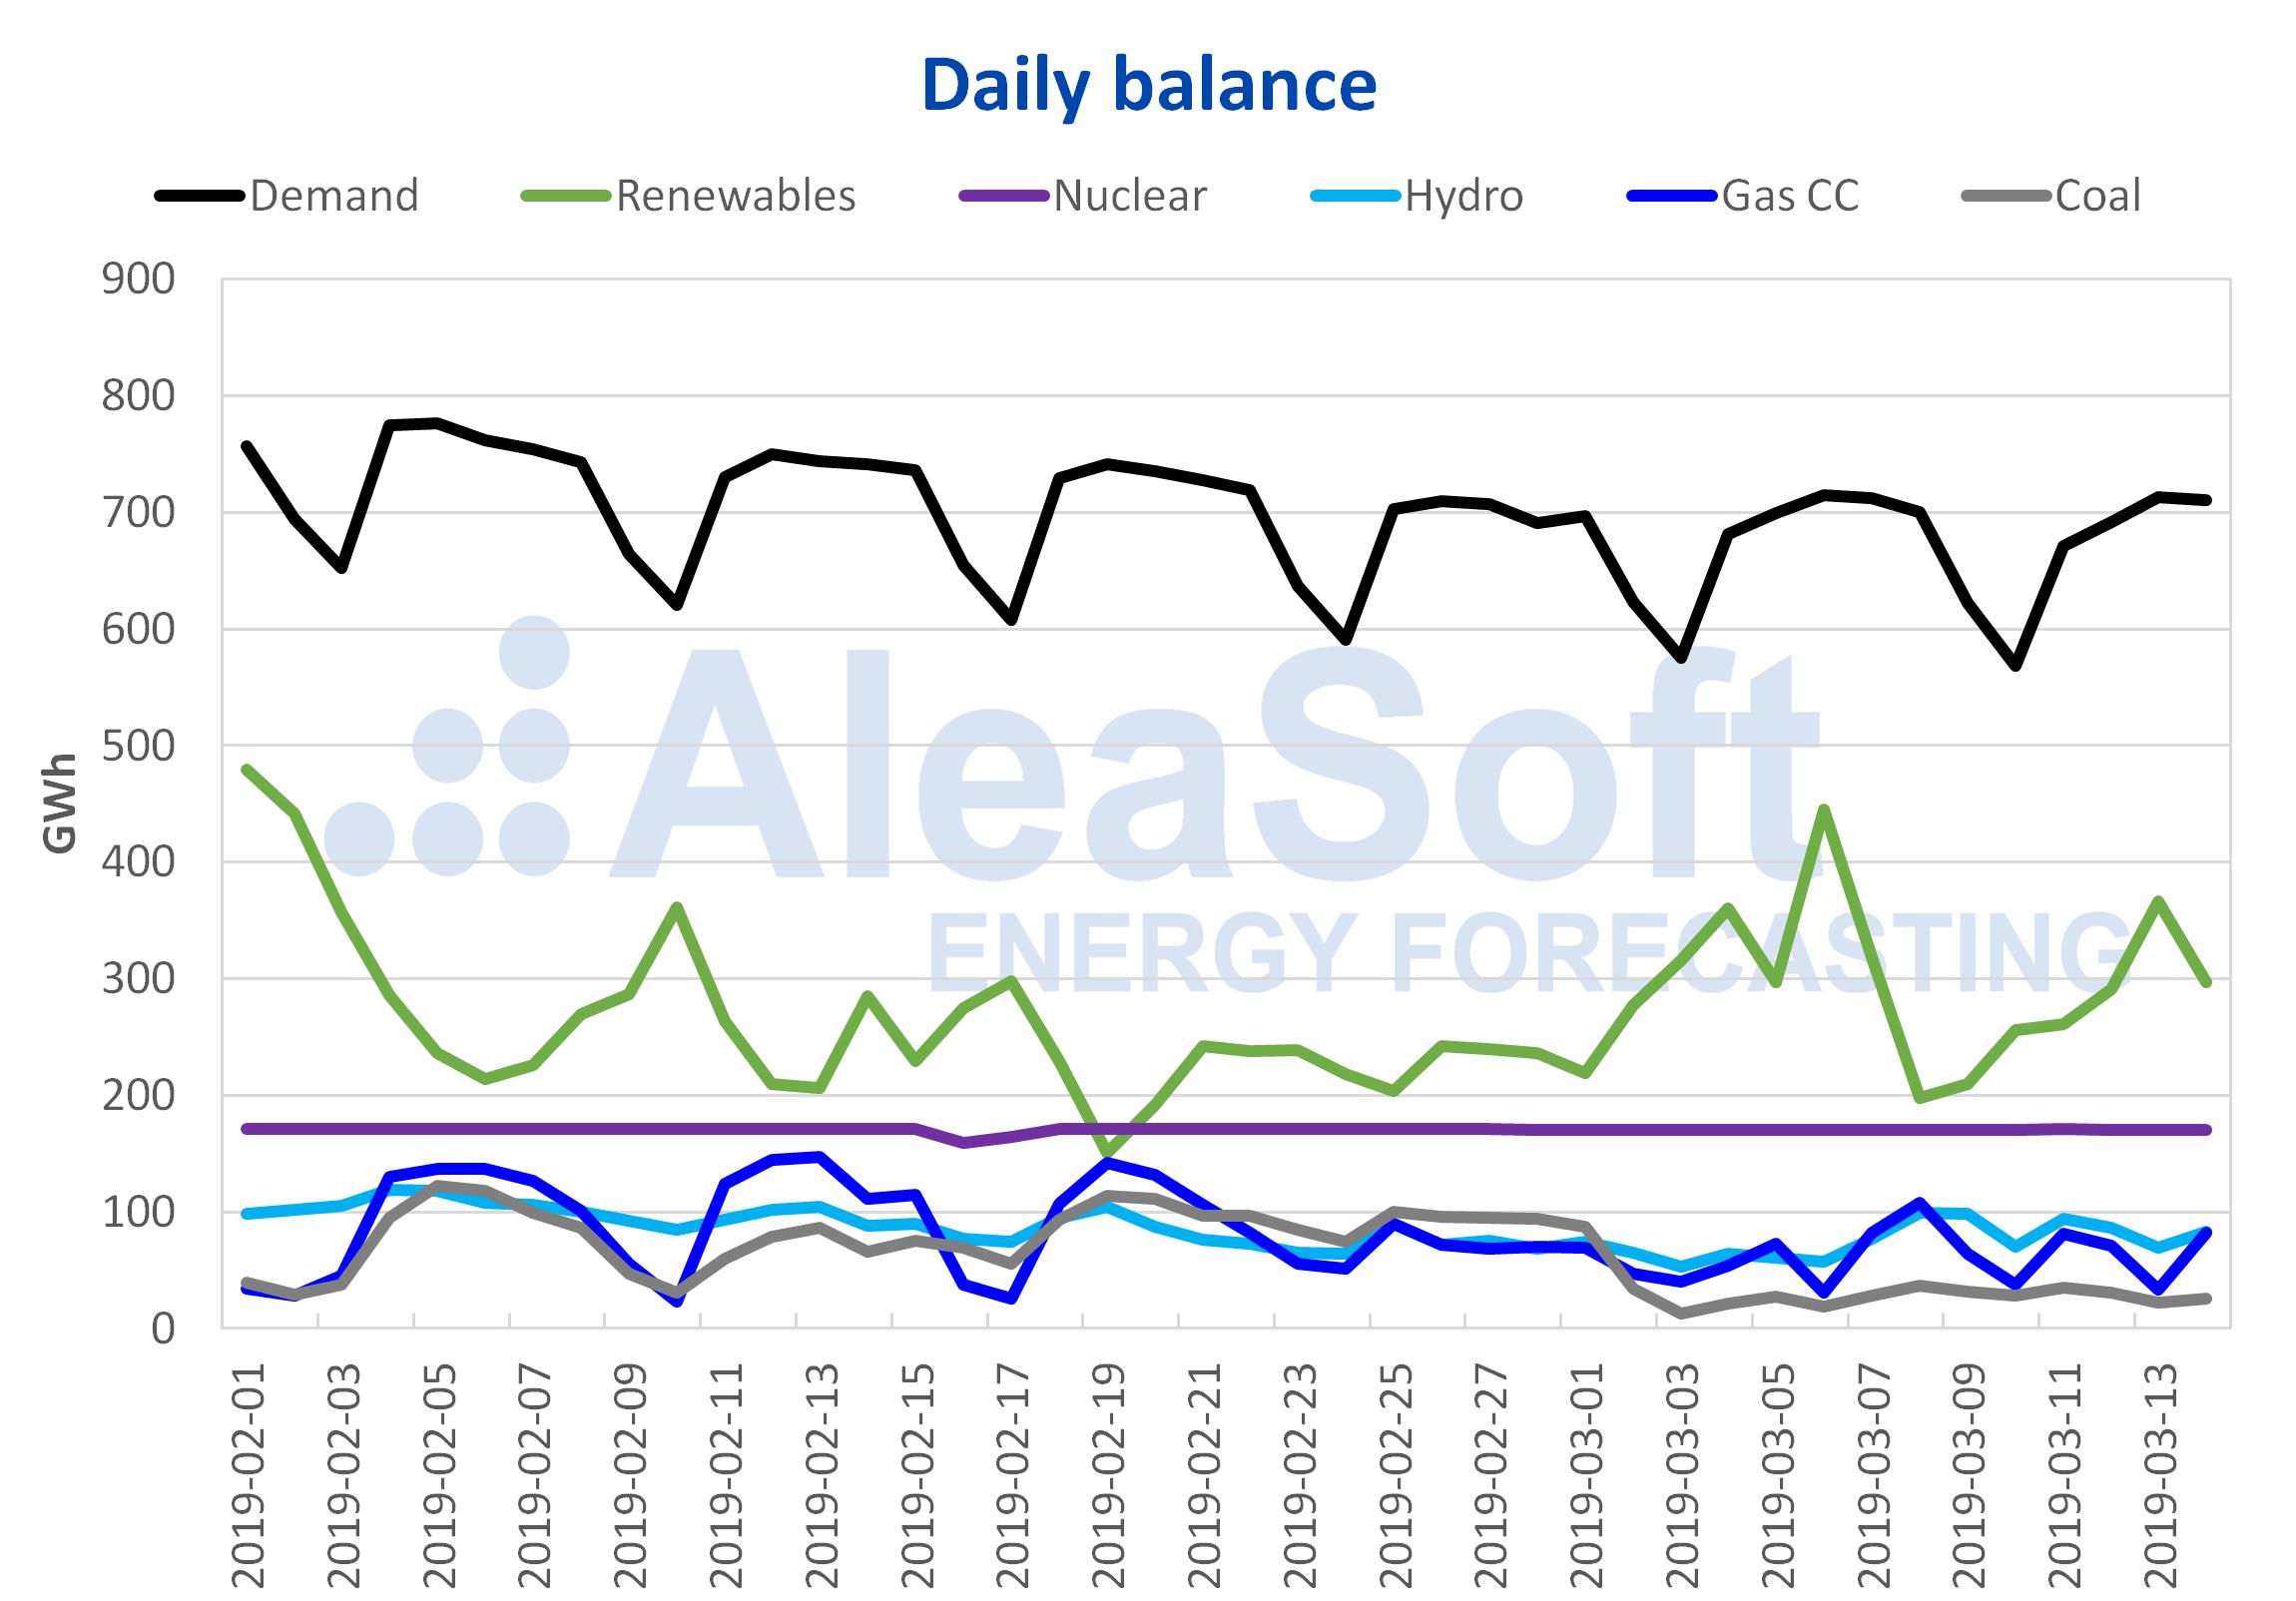 AleaSoft - Daily balance Spain demand production